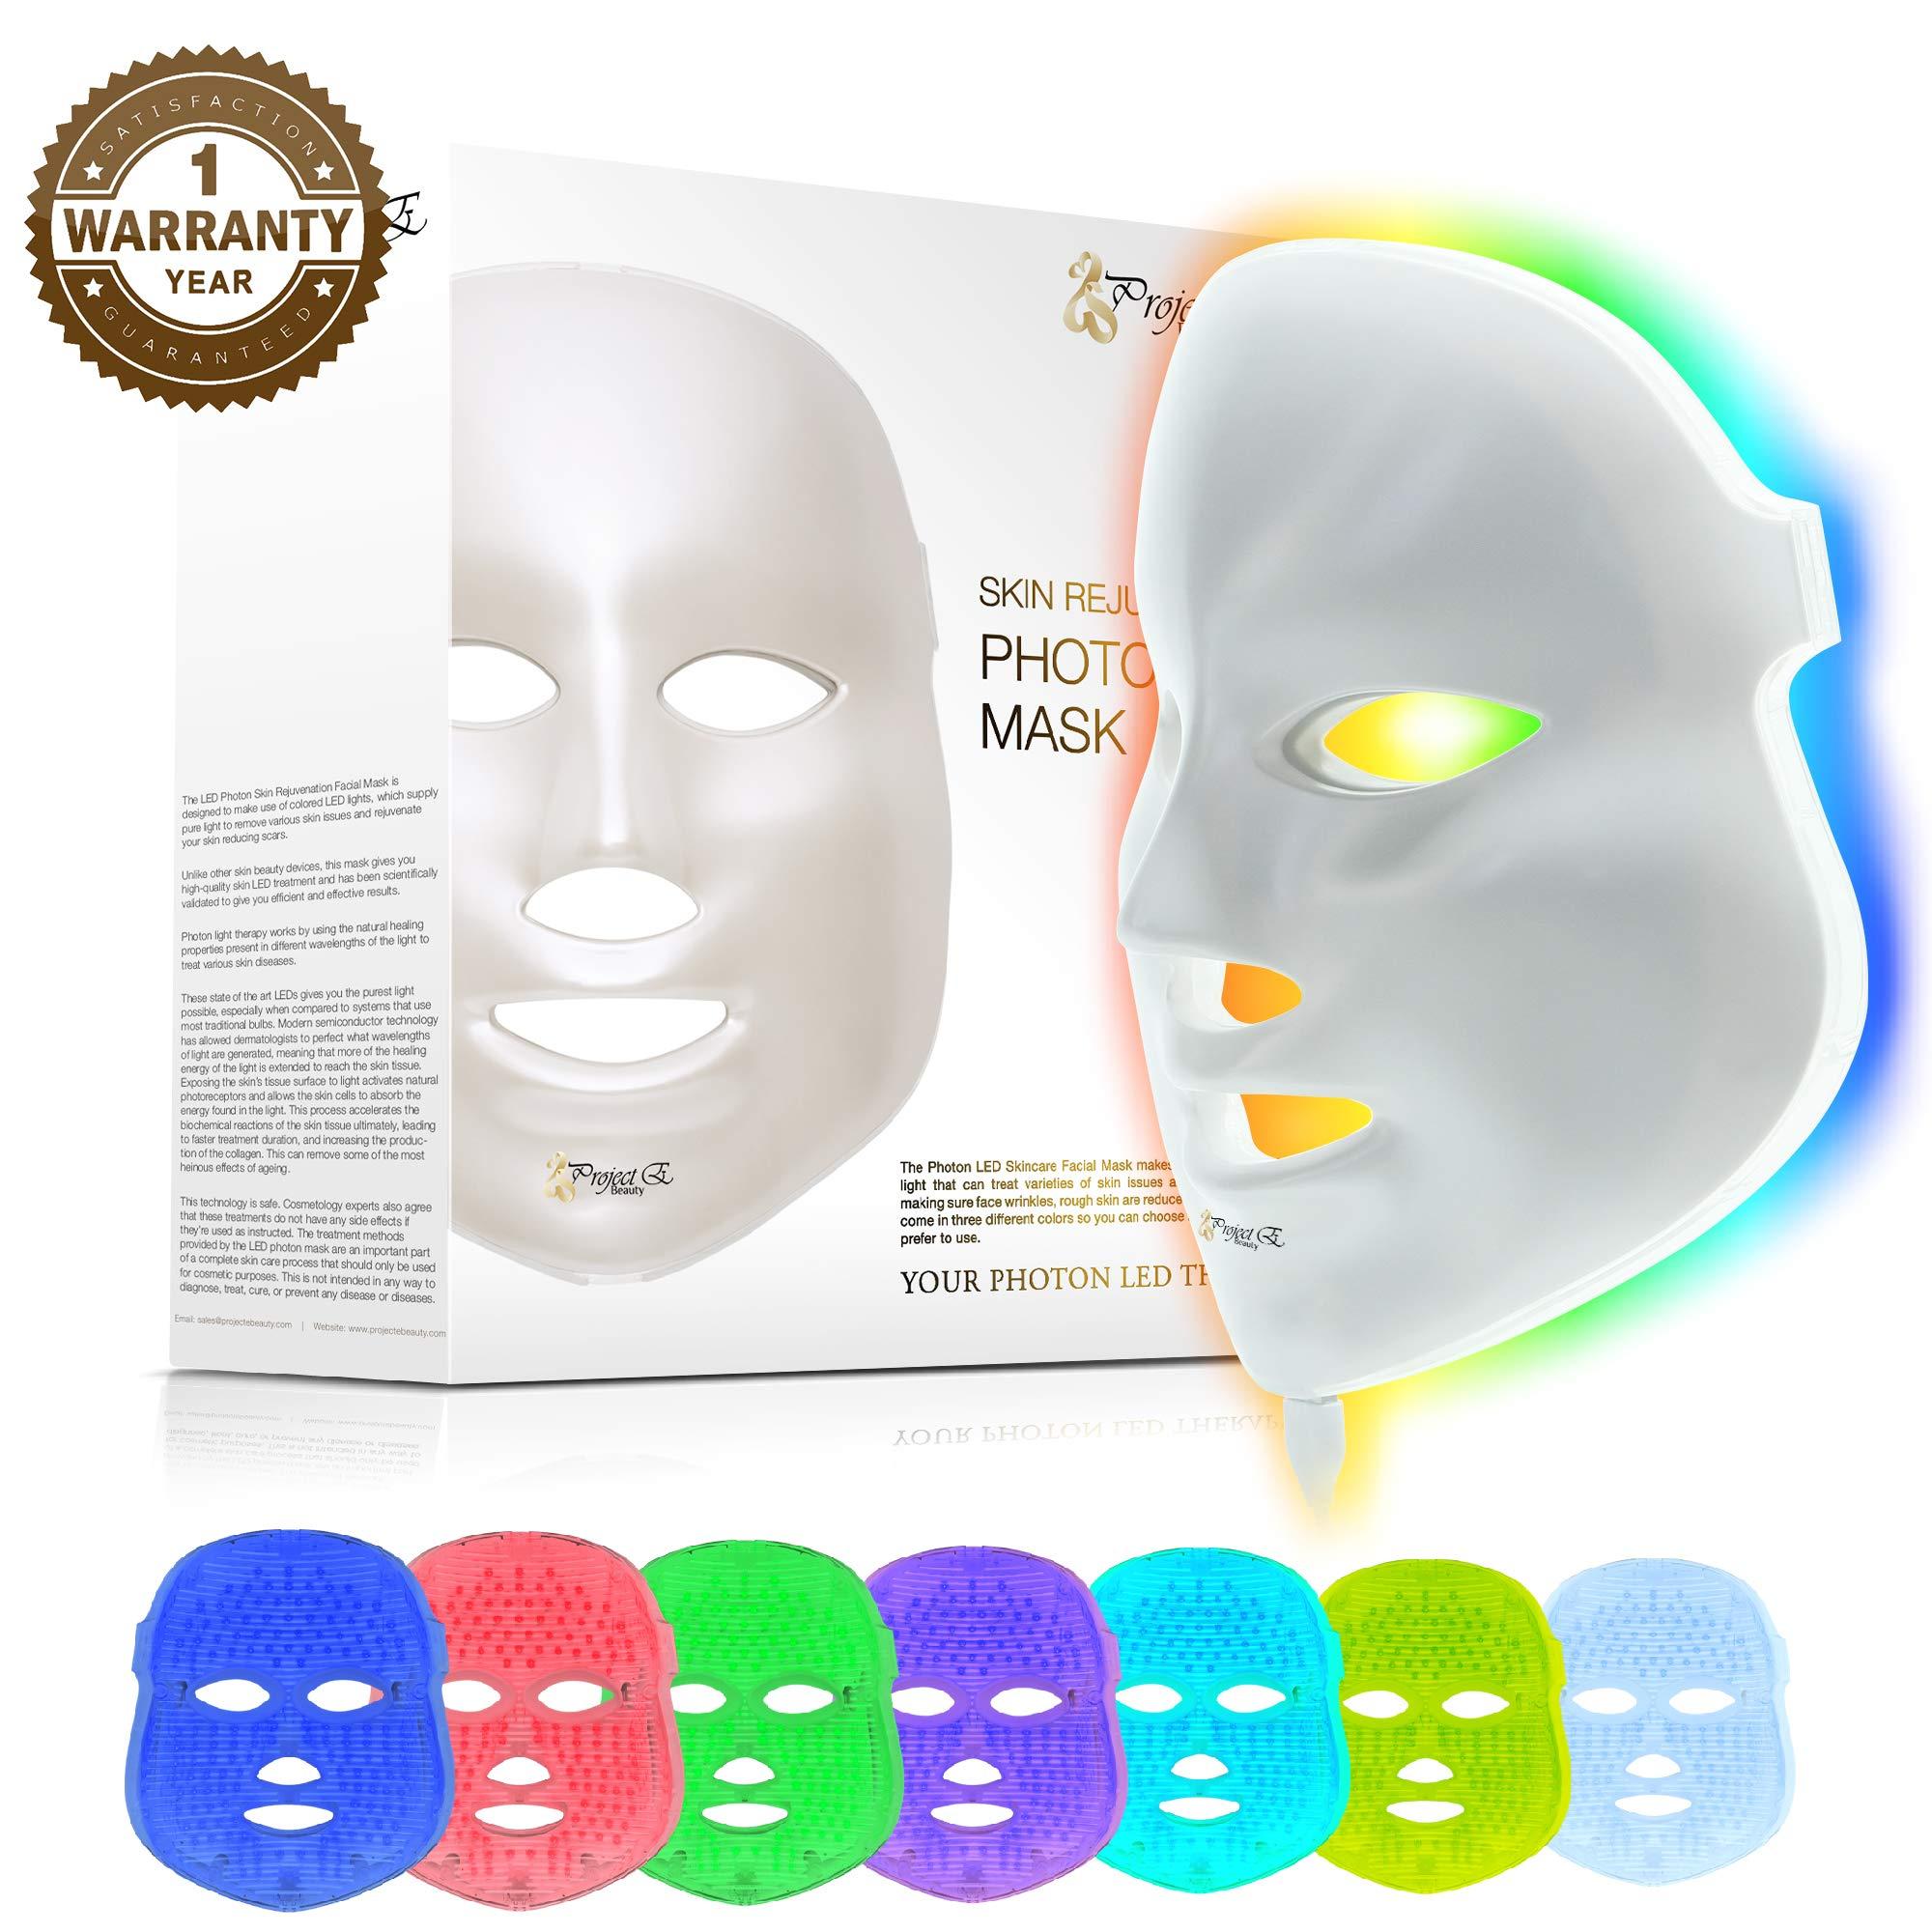 Project E Beauty 7 Color LED Mask Photon Light Skin Rejuvenation Therapy Facial Skin Care Mask